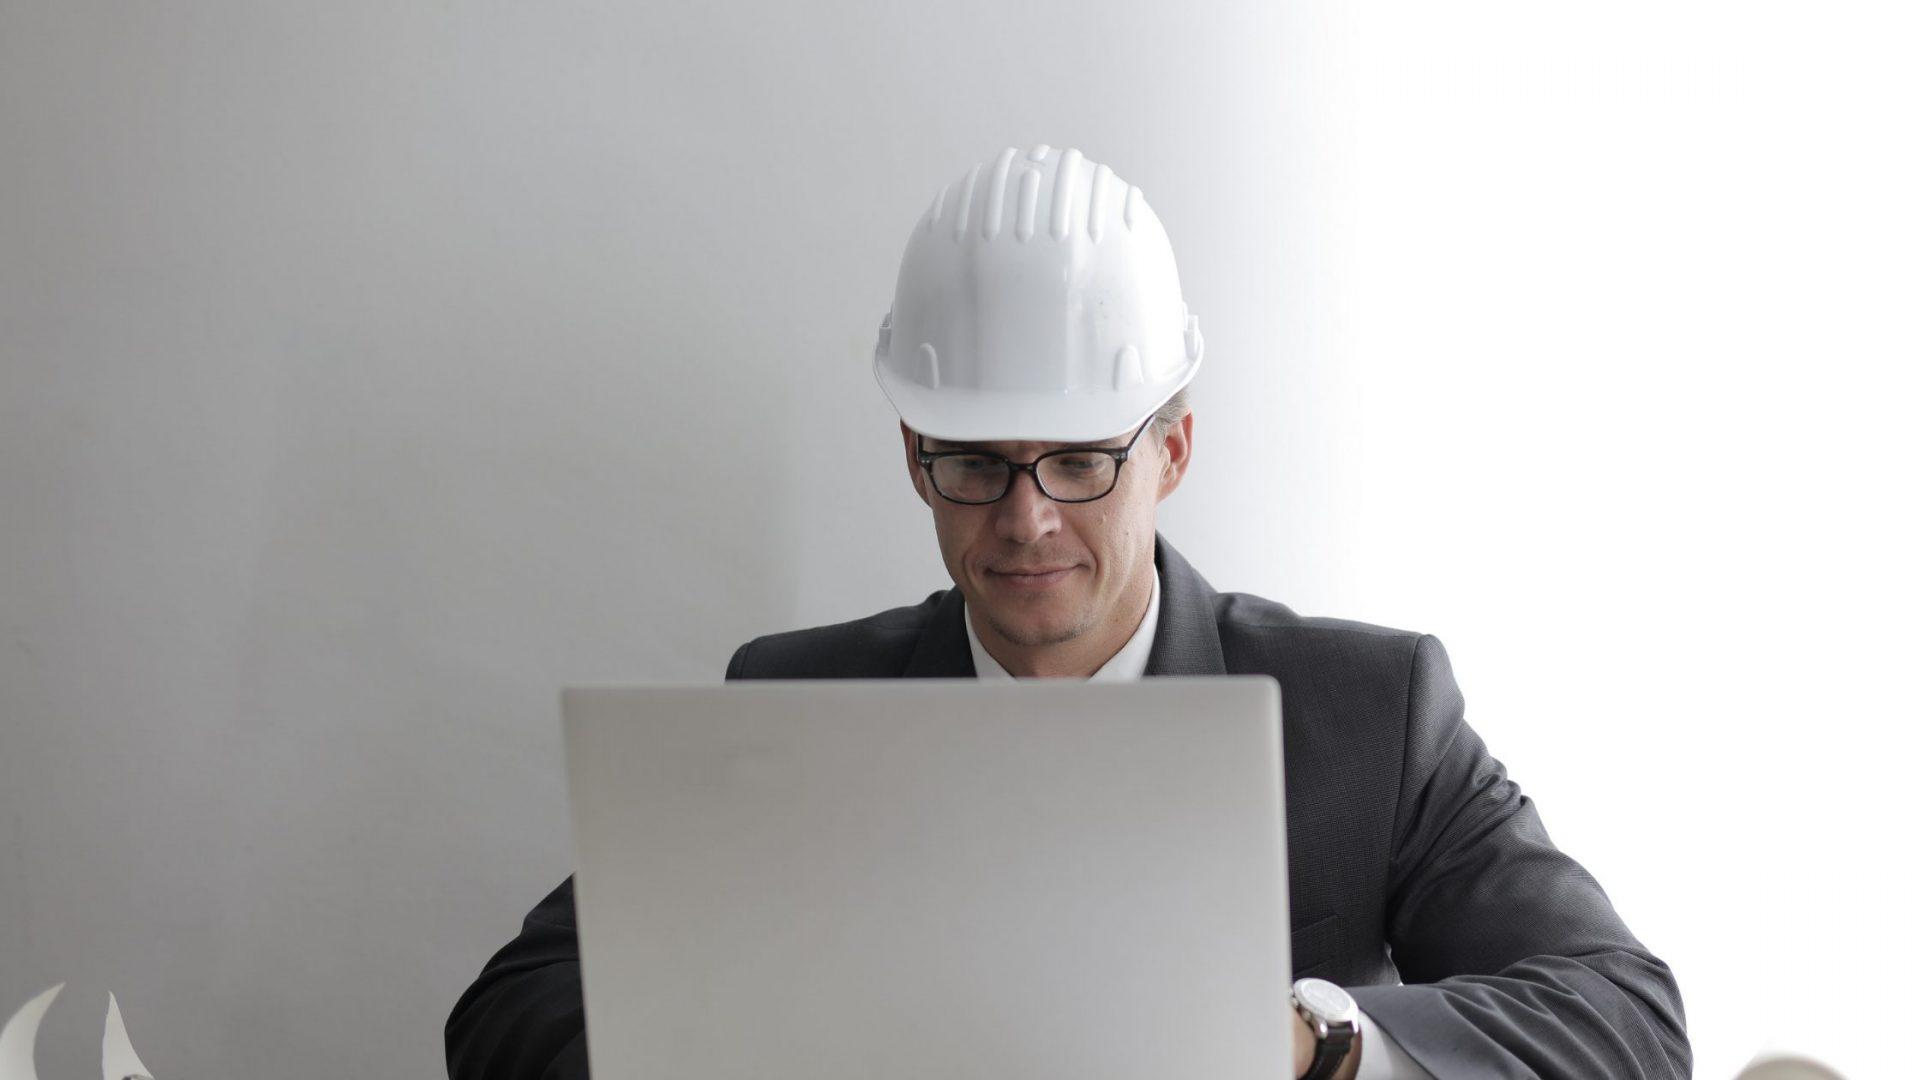 Engineer working on laptop